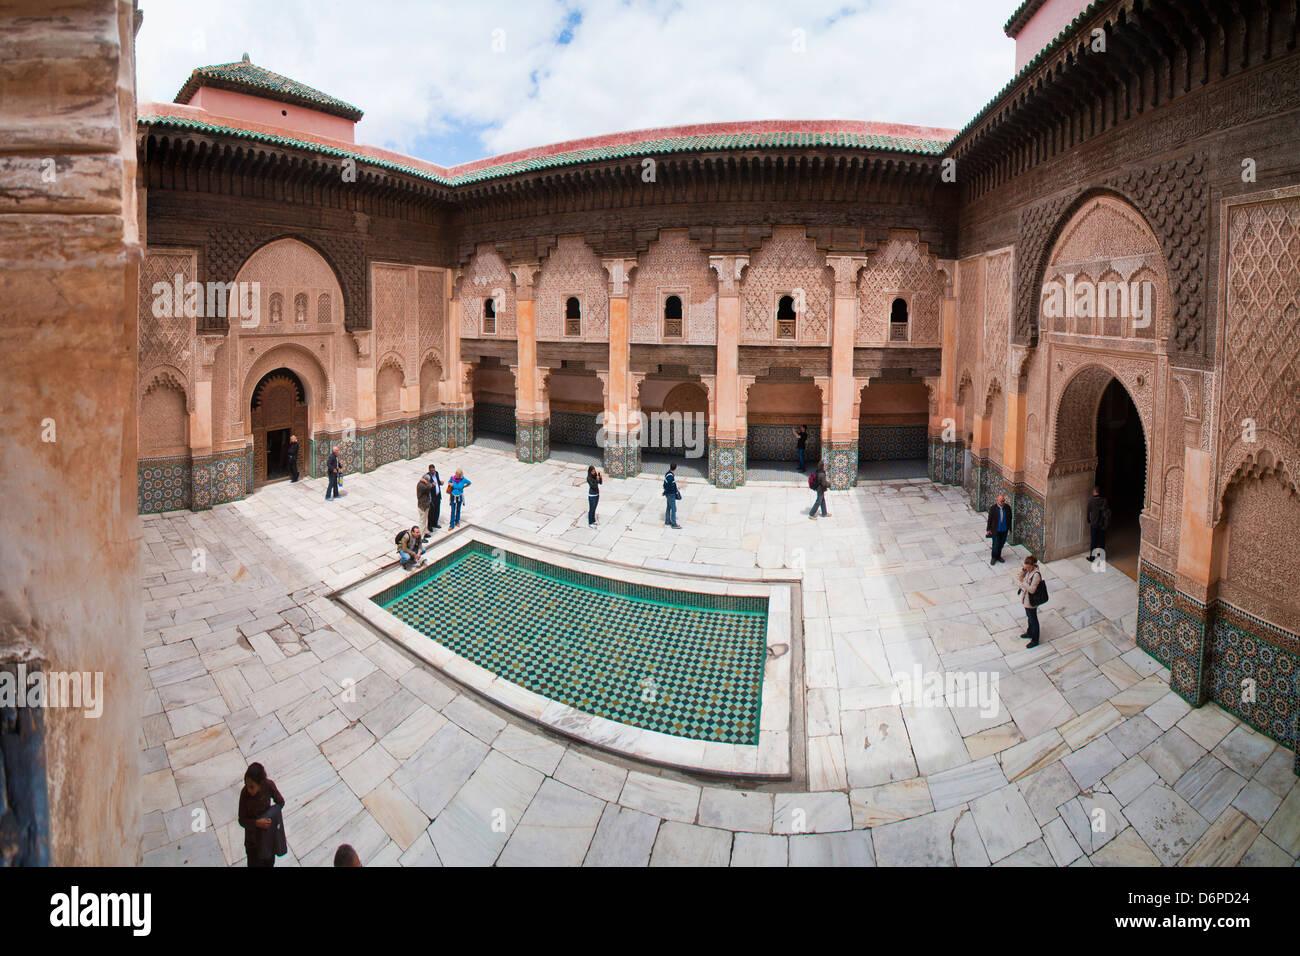 Tourists visiting Medersa Ben Youssef, the old Islamic Koranic school, Old Medina, Marrakech, Morocco, North Africa, - Stock Image